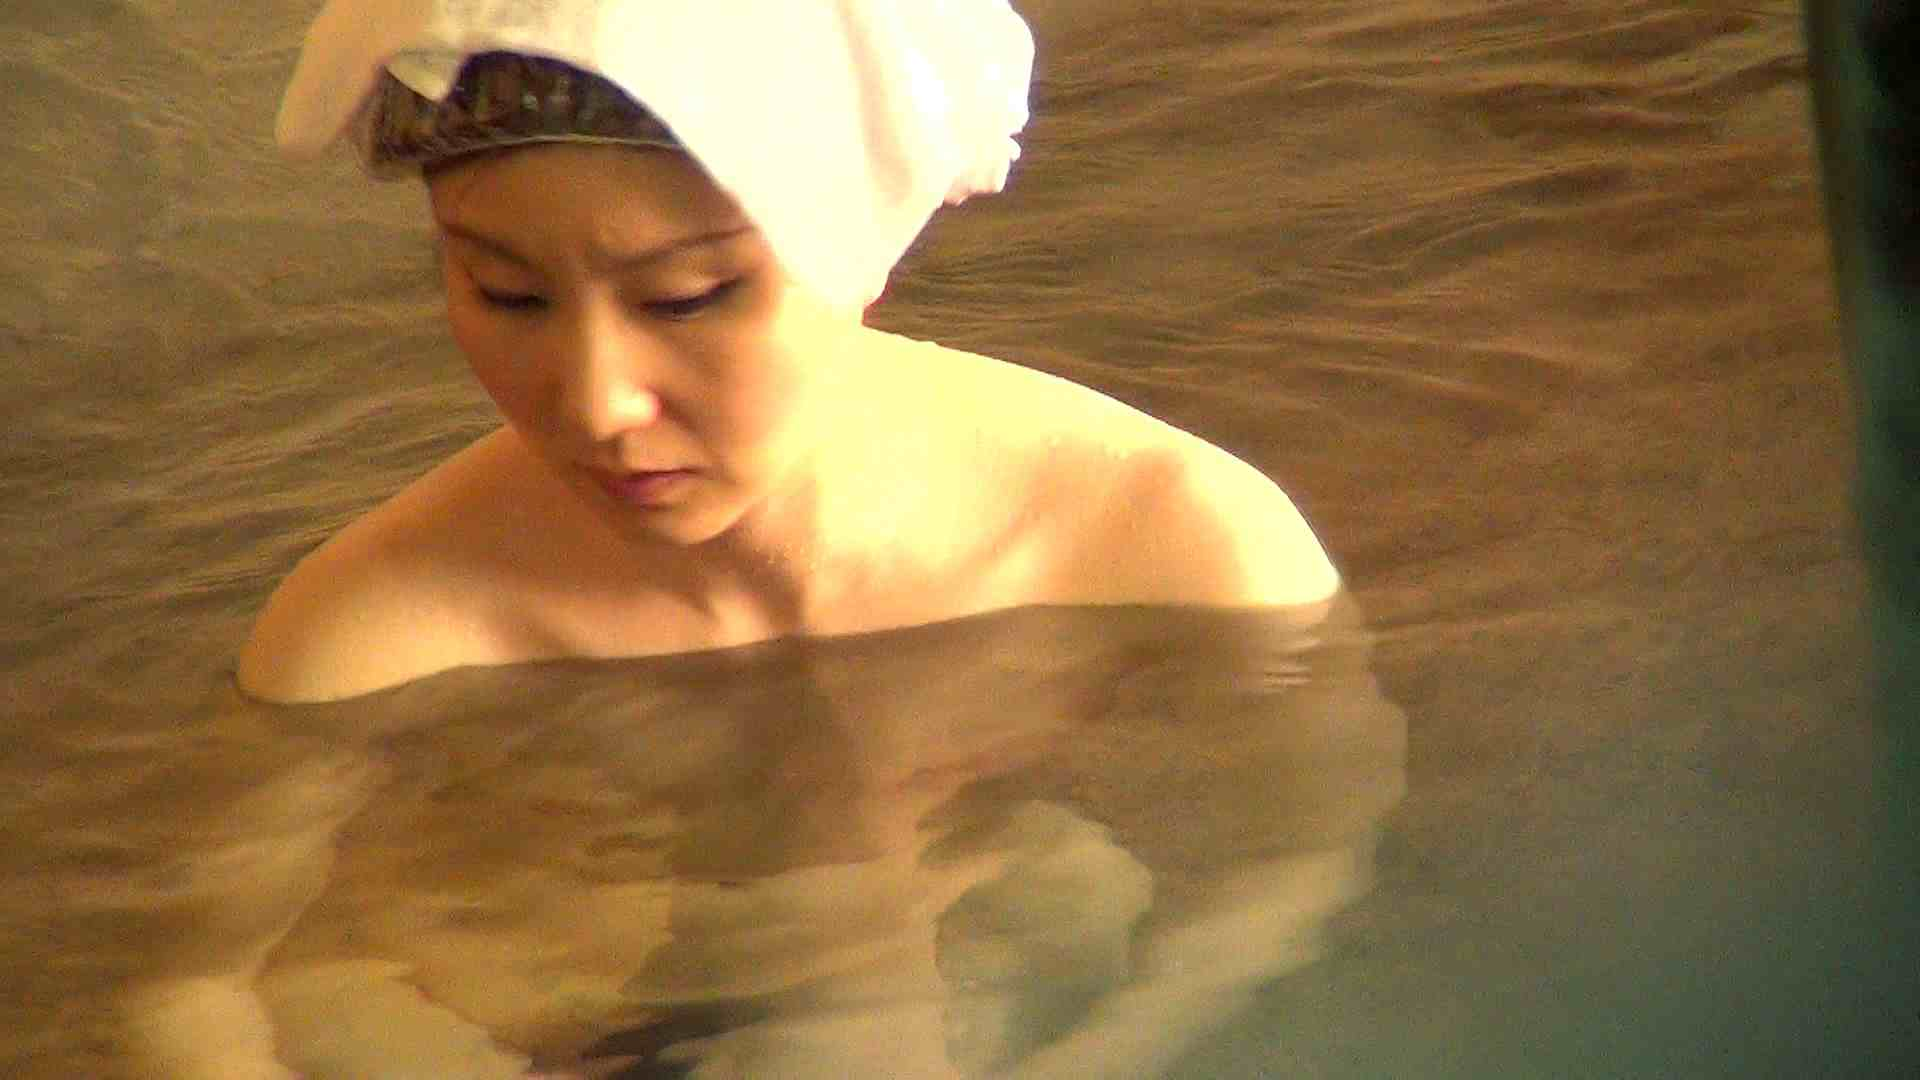 Aquaな露天風呂Vol.278 盗撮シリーズ | 露天風呂編  100PIX 65